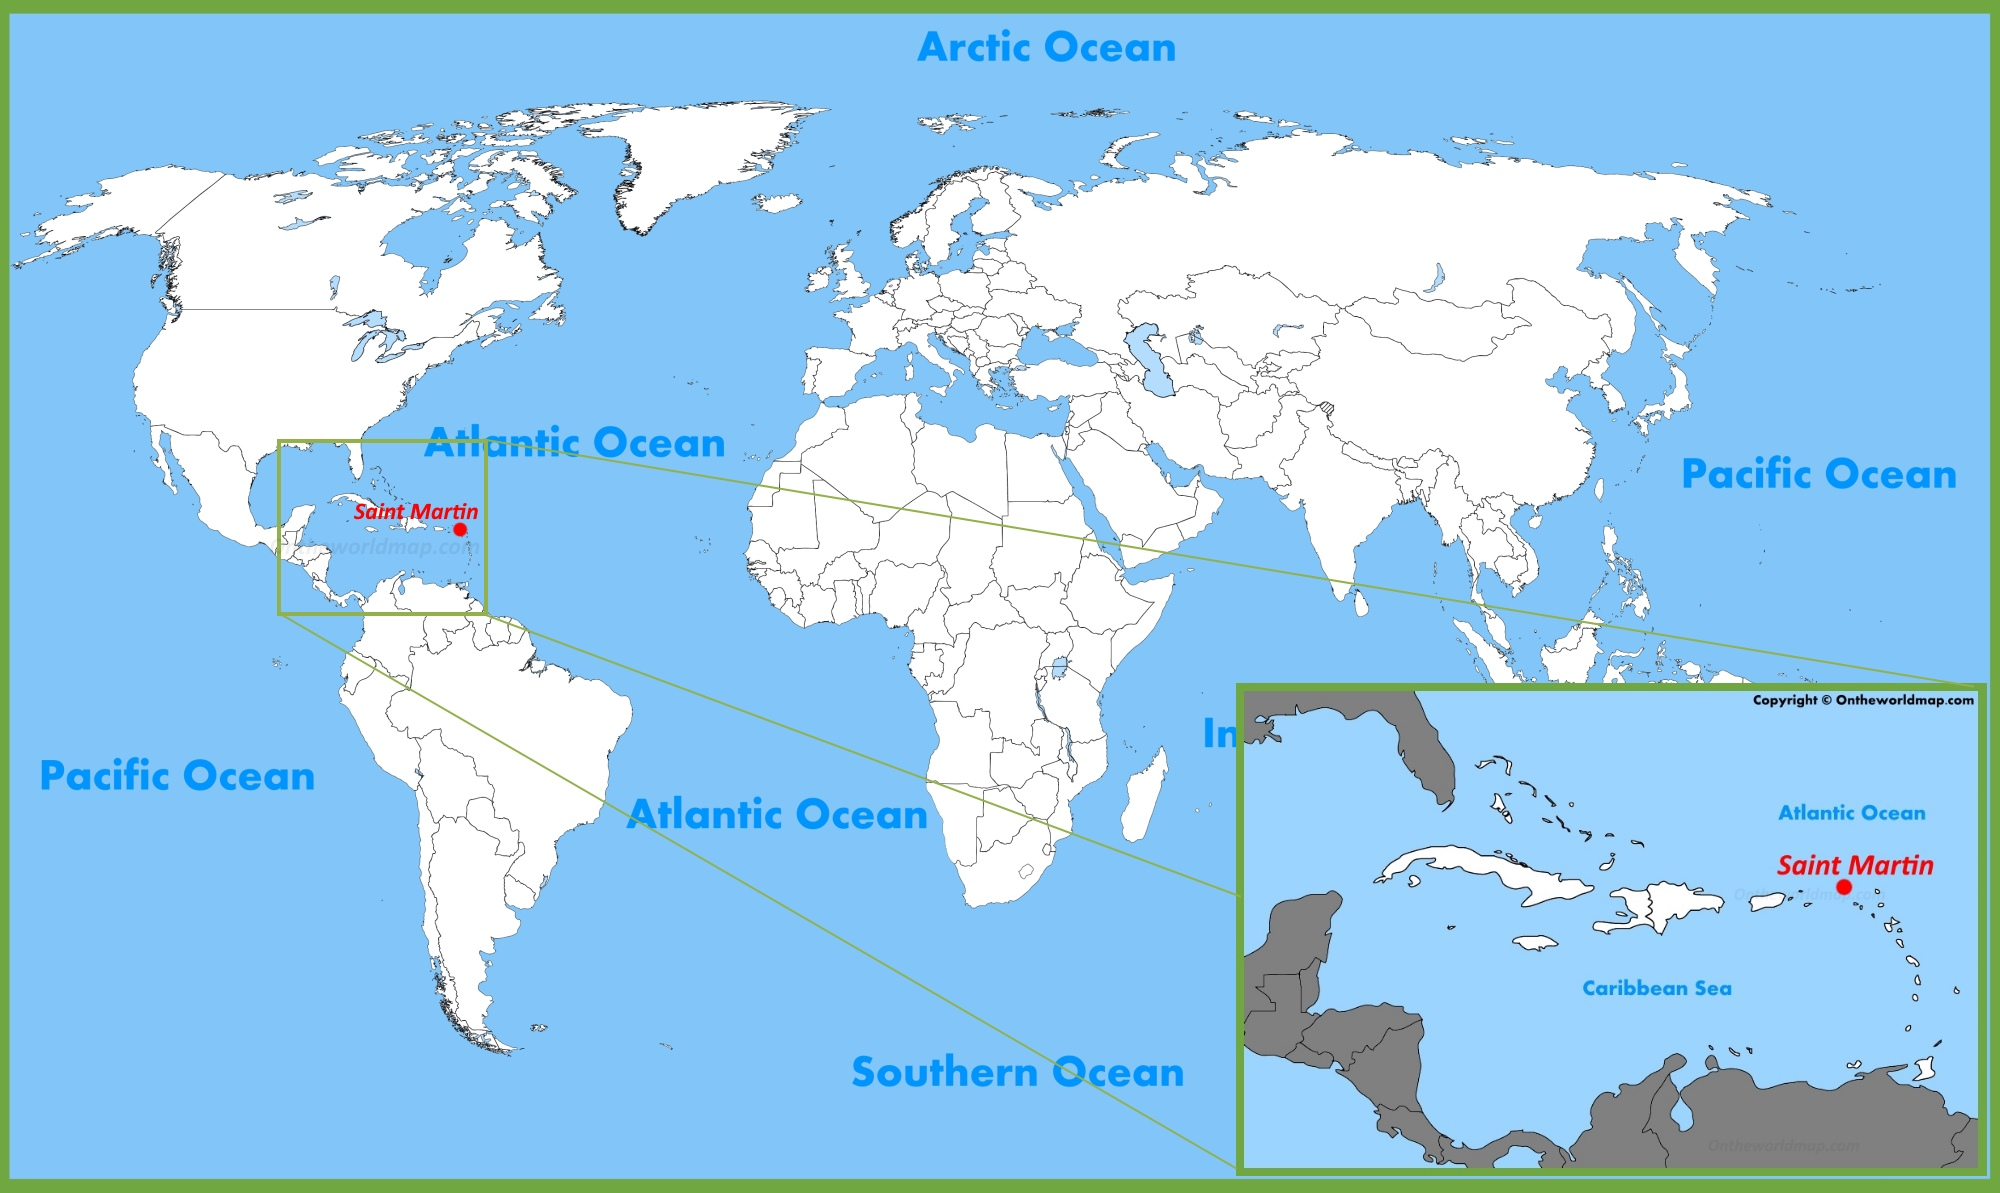 Saint Martin Location on the World Map